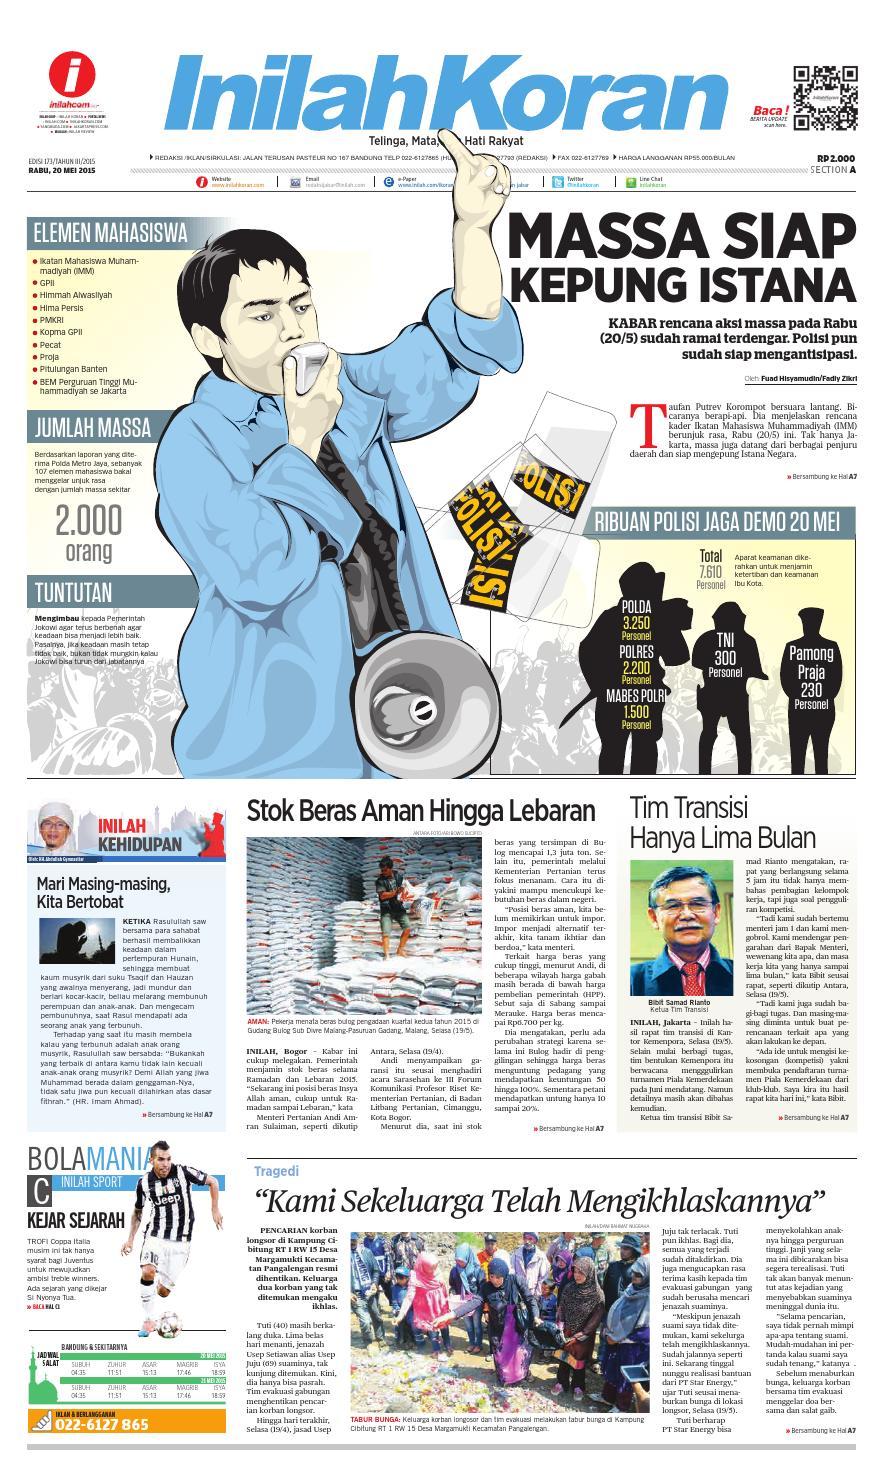 Massa Siap Kepung Istana By Inilah Koran Issuu Produk Ukm Bumn Bahan Songket Sulam Katun Merah